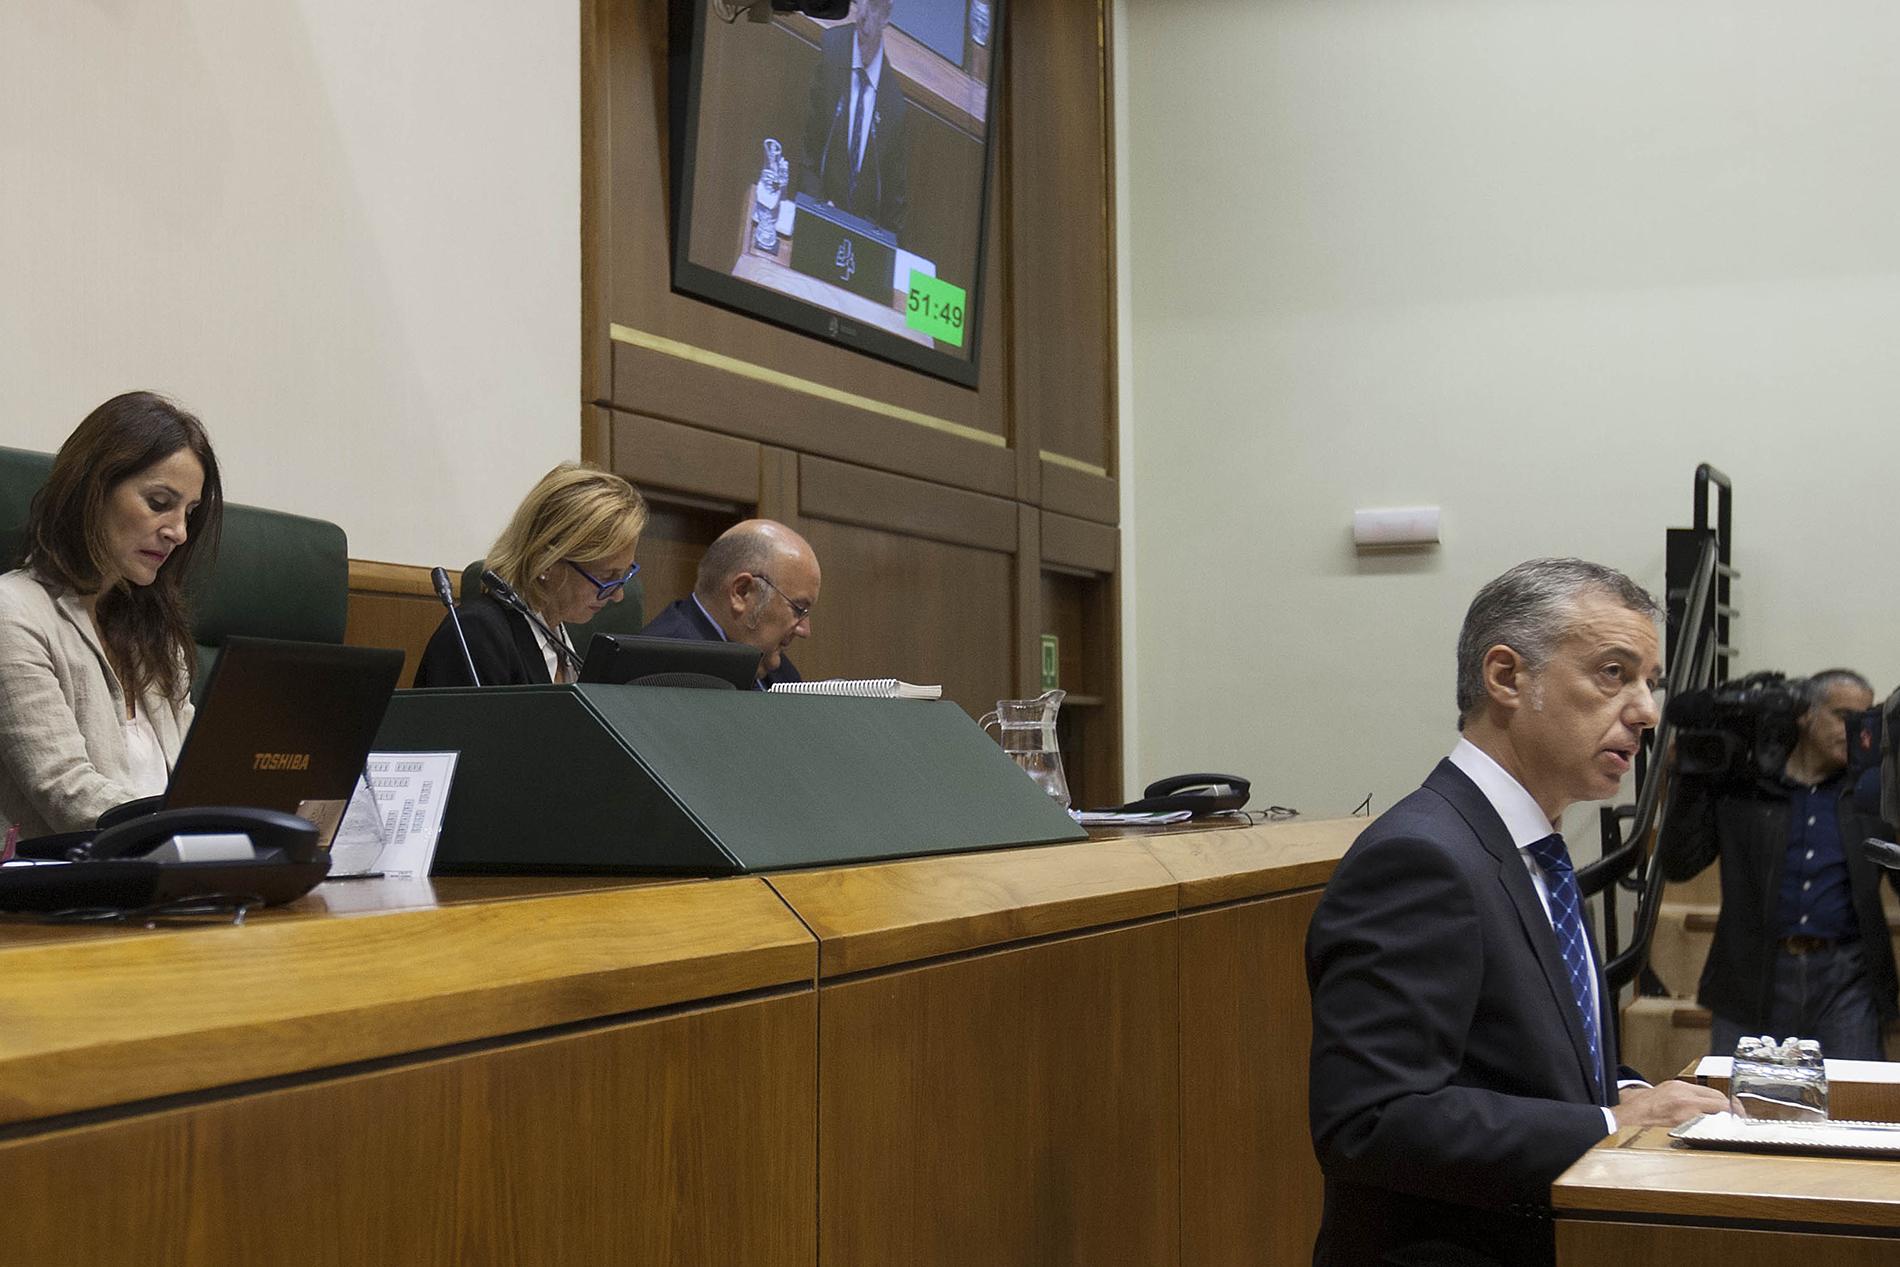 2015_09_24_lhk_parlamento_012.jpg